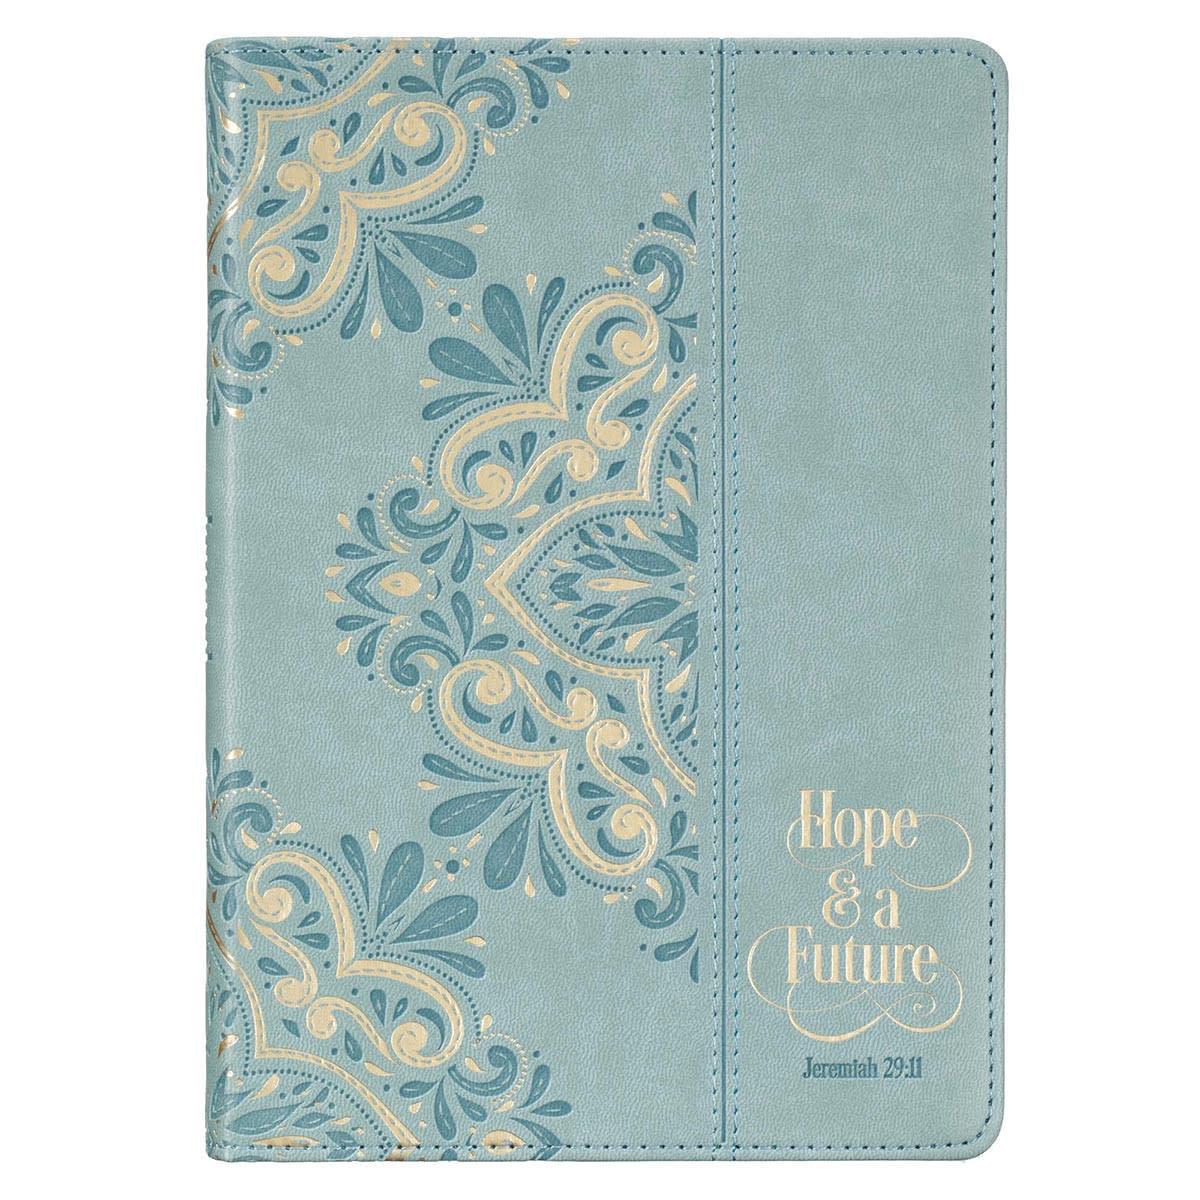 Christian Art Gifts Hope & A Future Journal